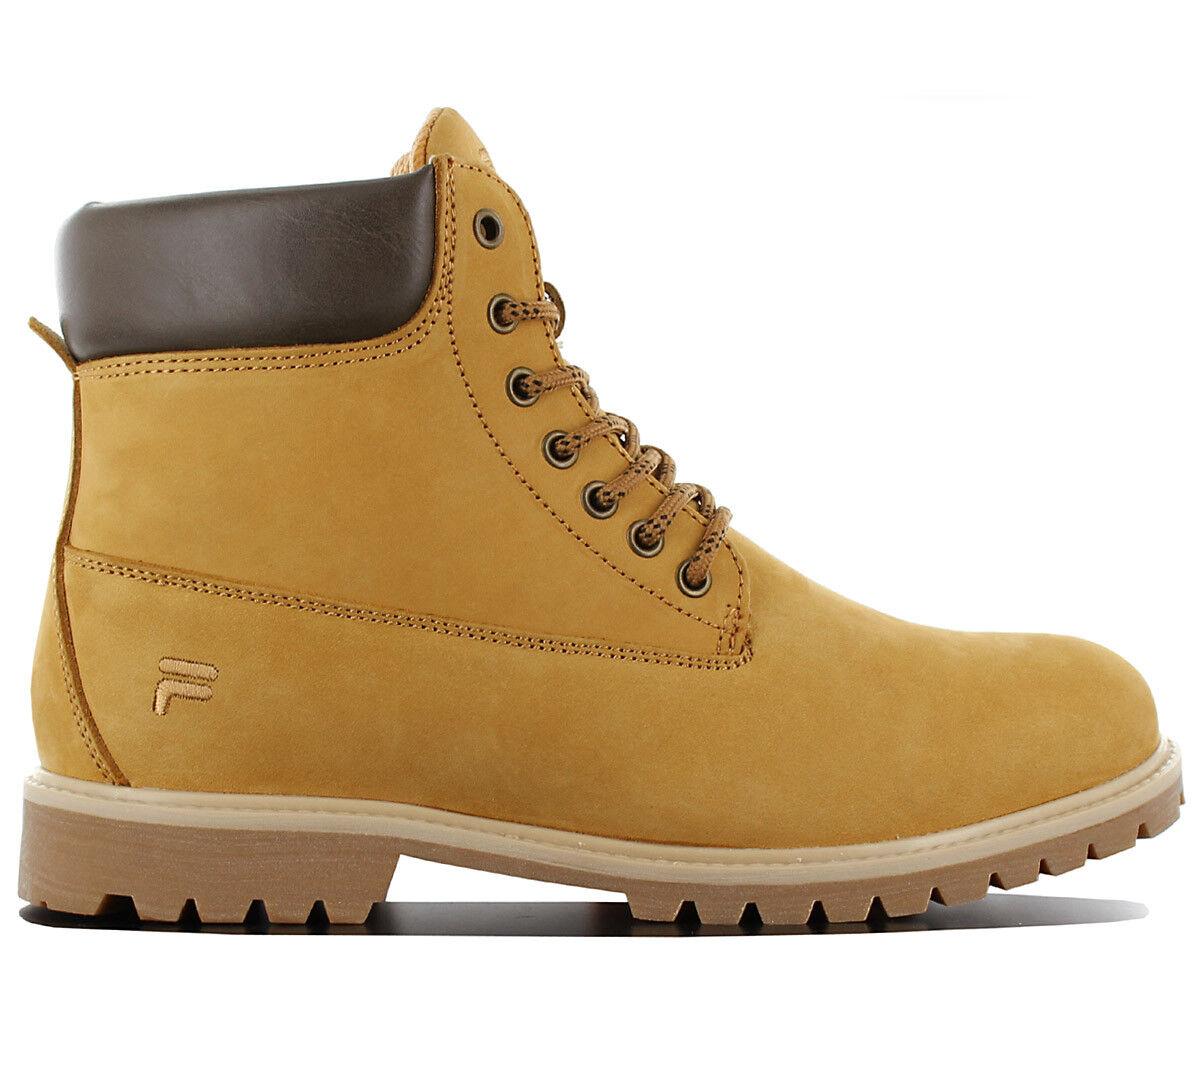 Fila boisland N Mid Homme Hiver Bottes Chaussures Cuir Beige 1010149.EDU